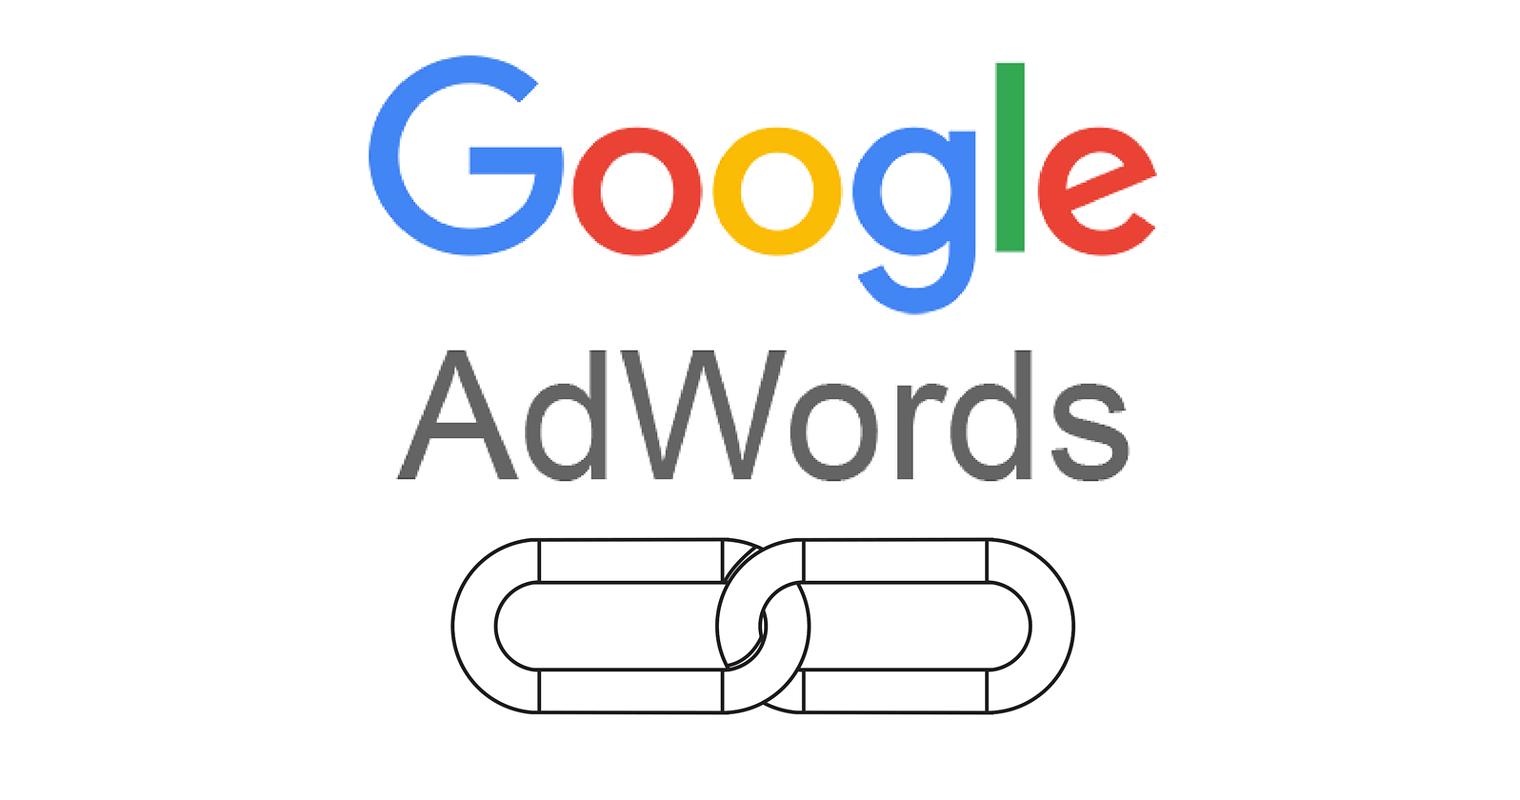 Google AdWords Integrates With Google Optimize and Google Surveys 360